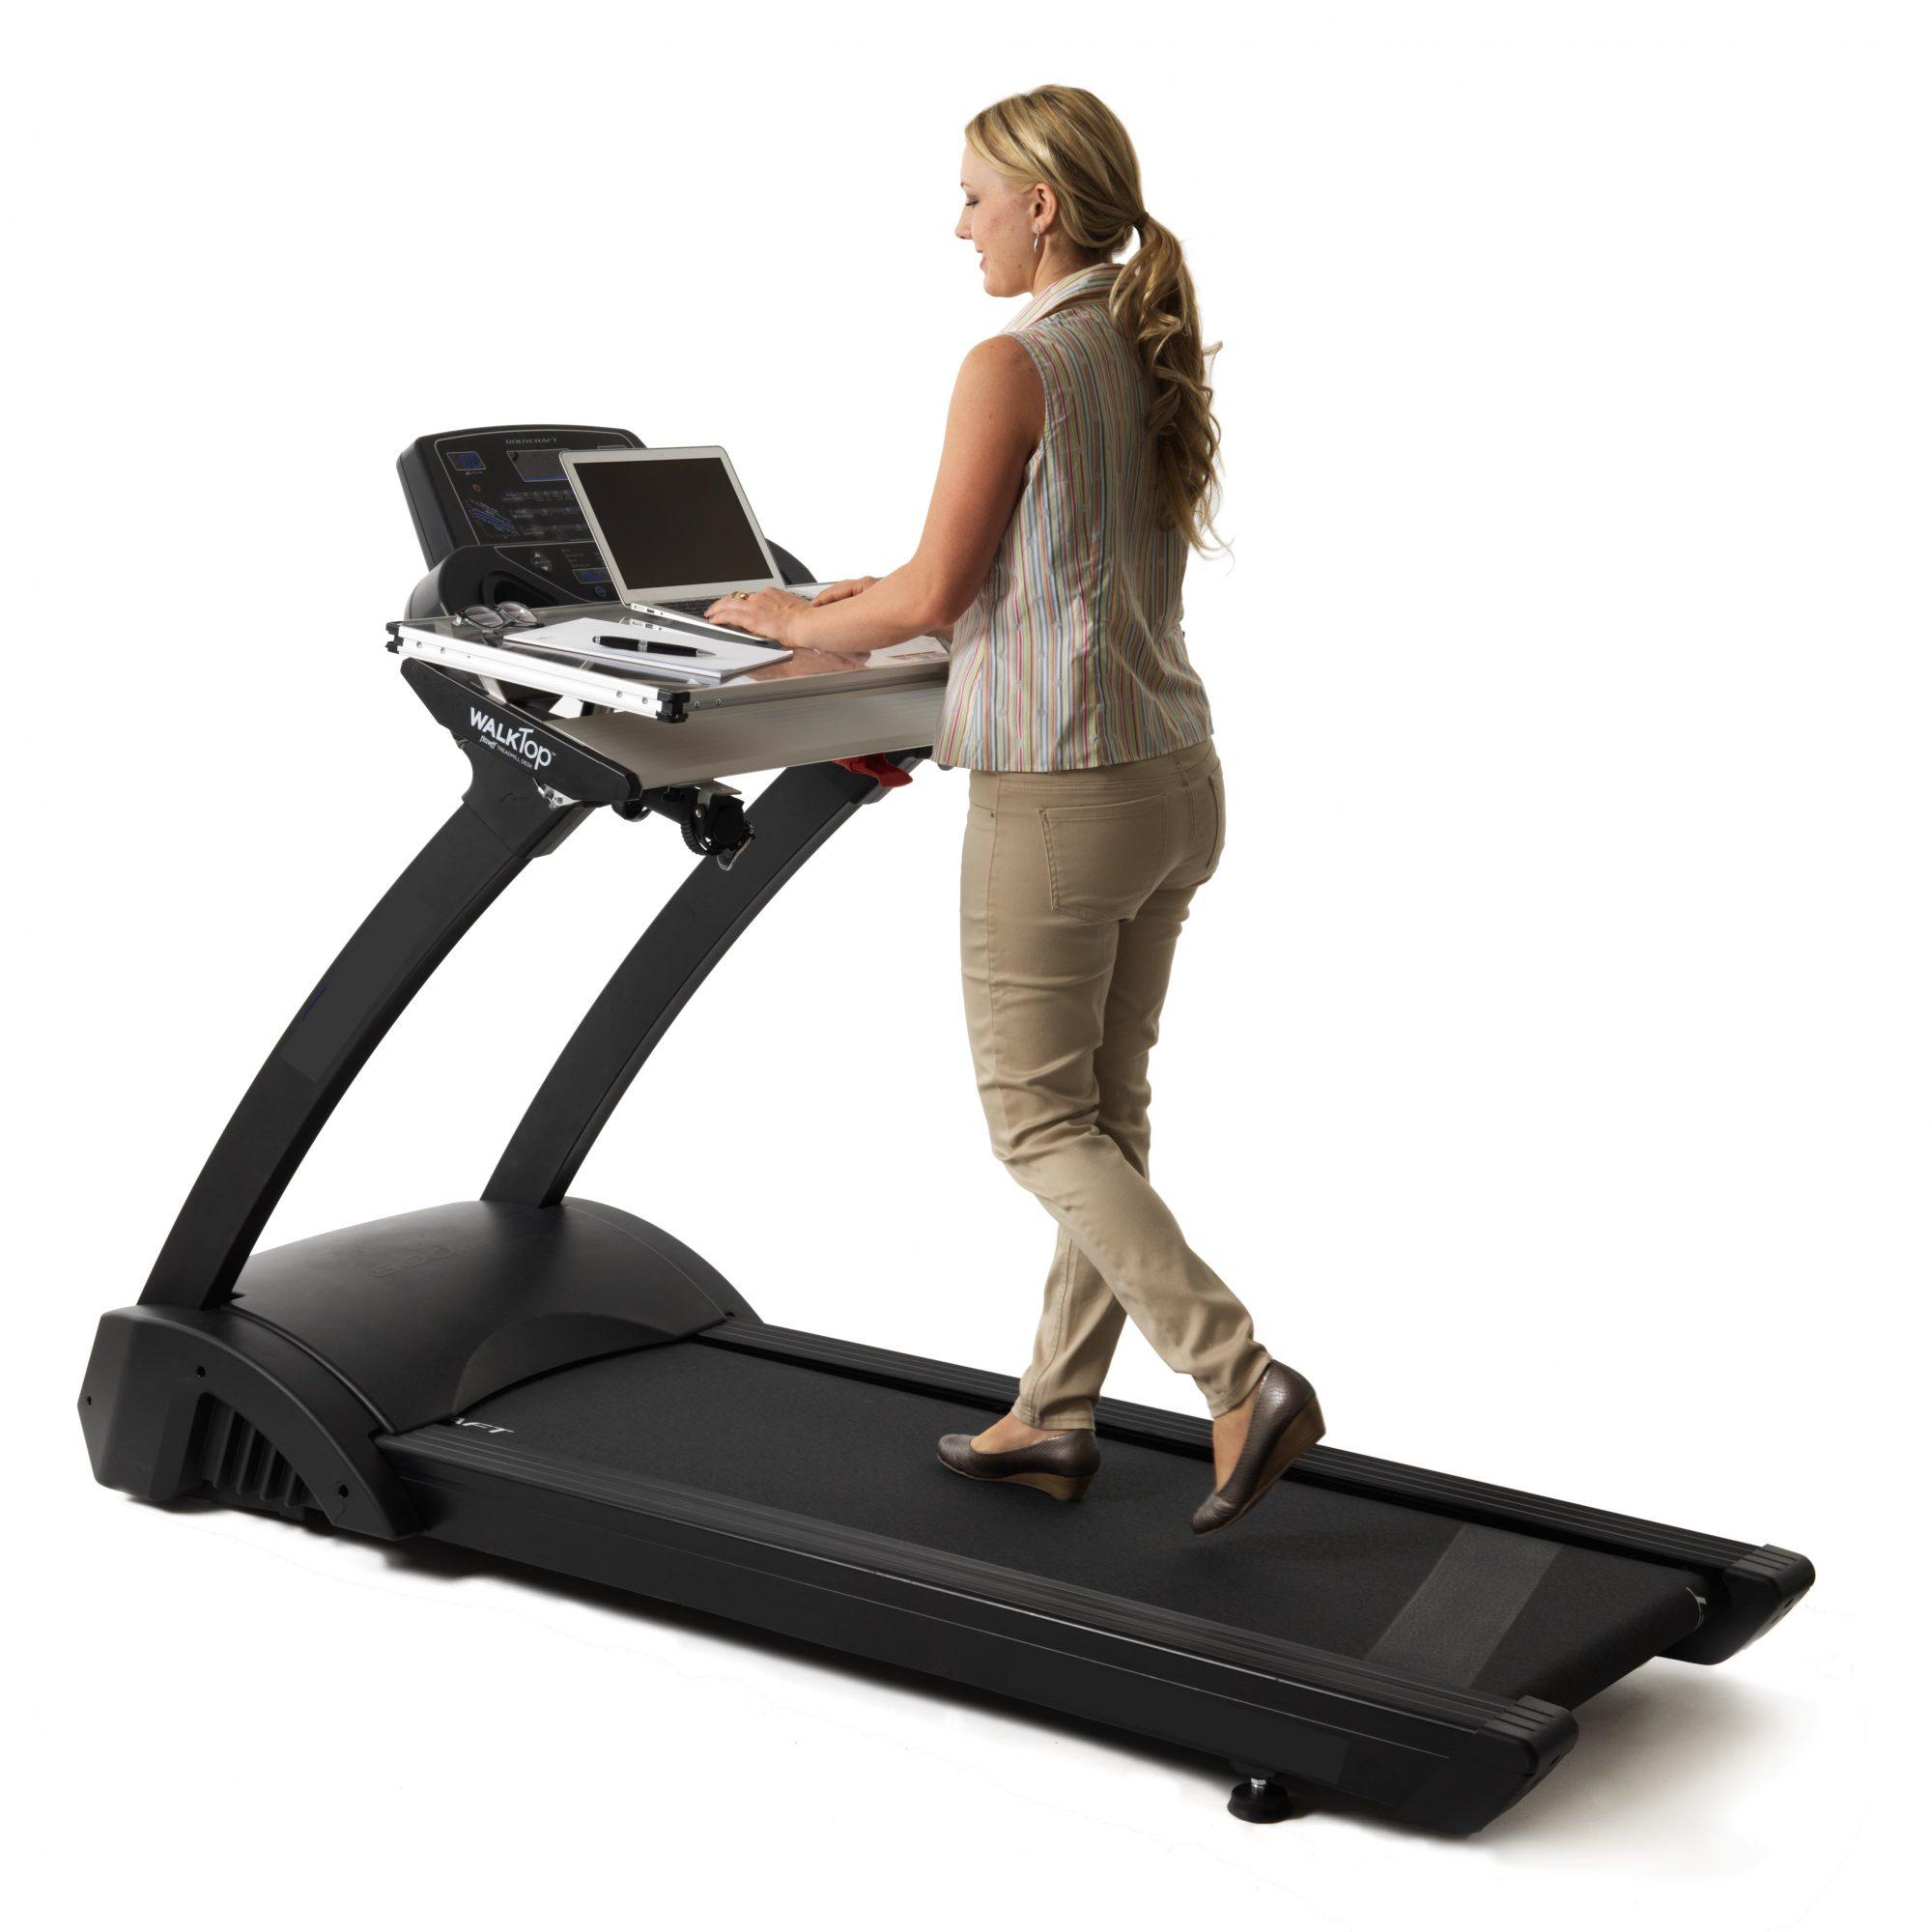 review equipment best desk min for our exercise pinterest